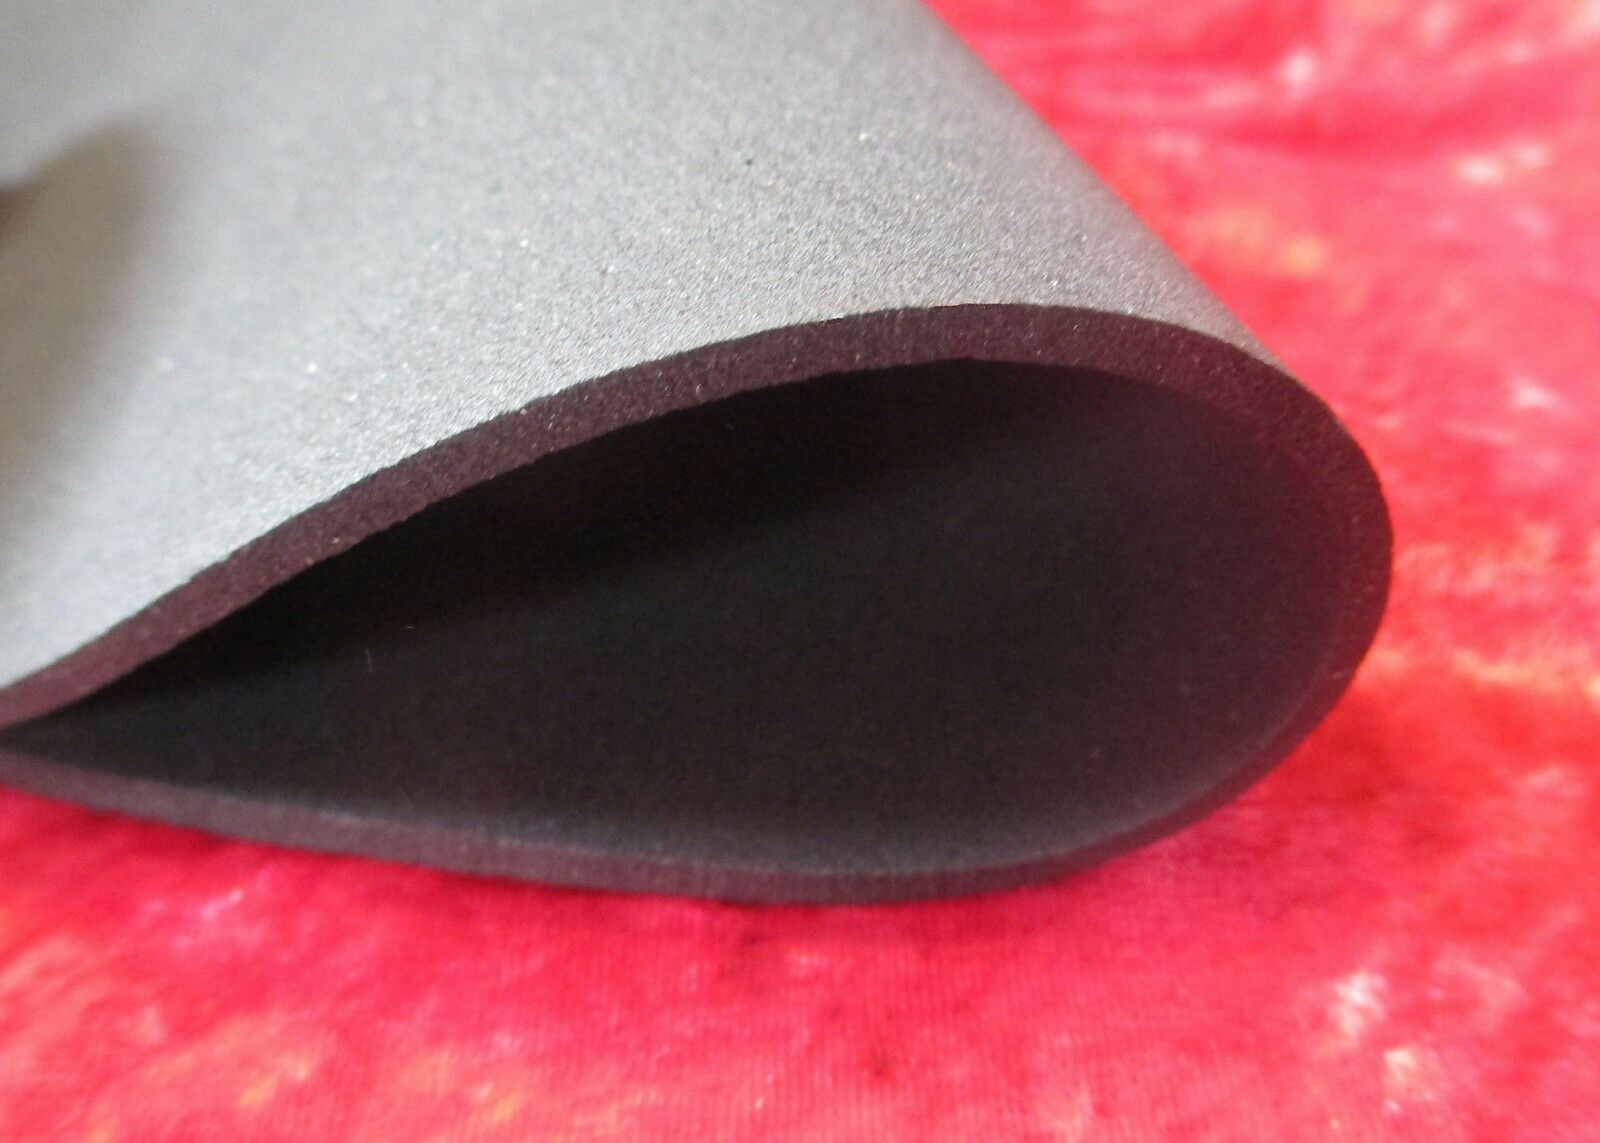 Set of 2 U.K. Made Black Soft Foam Turntable Mat - 294mm. Diam Improved Sound